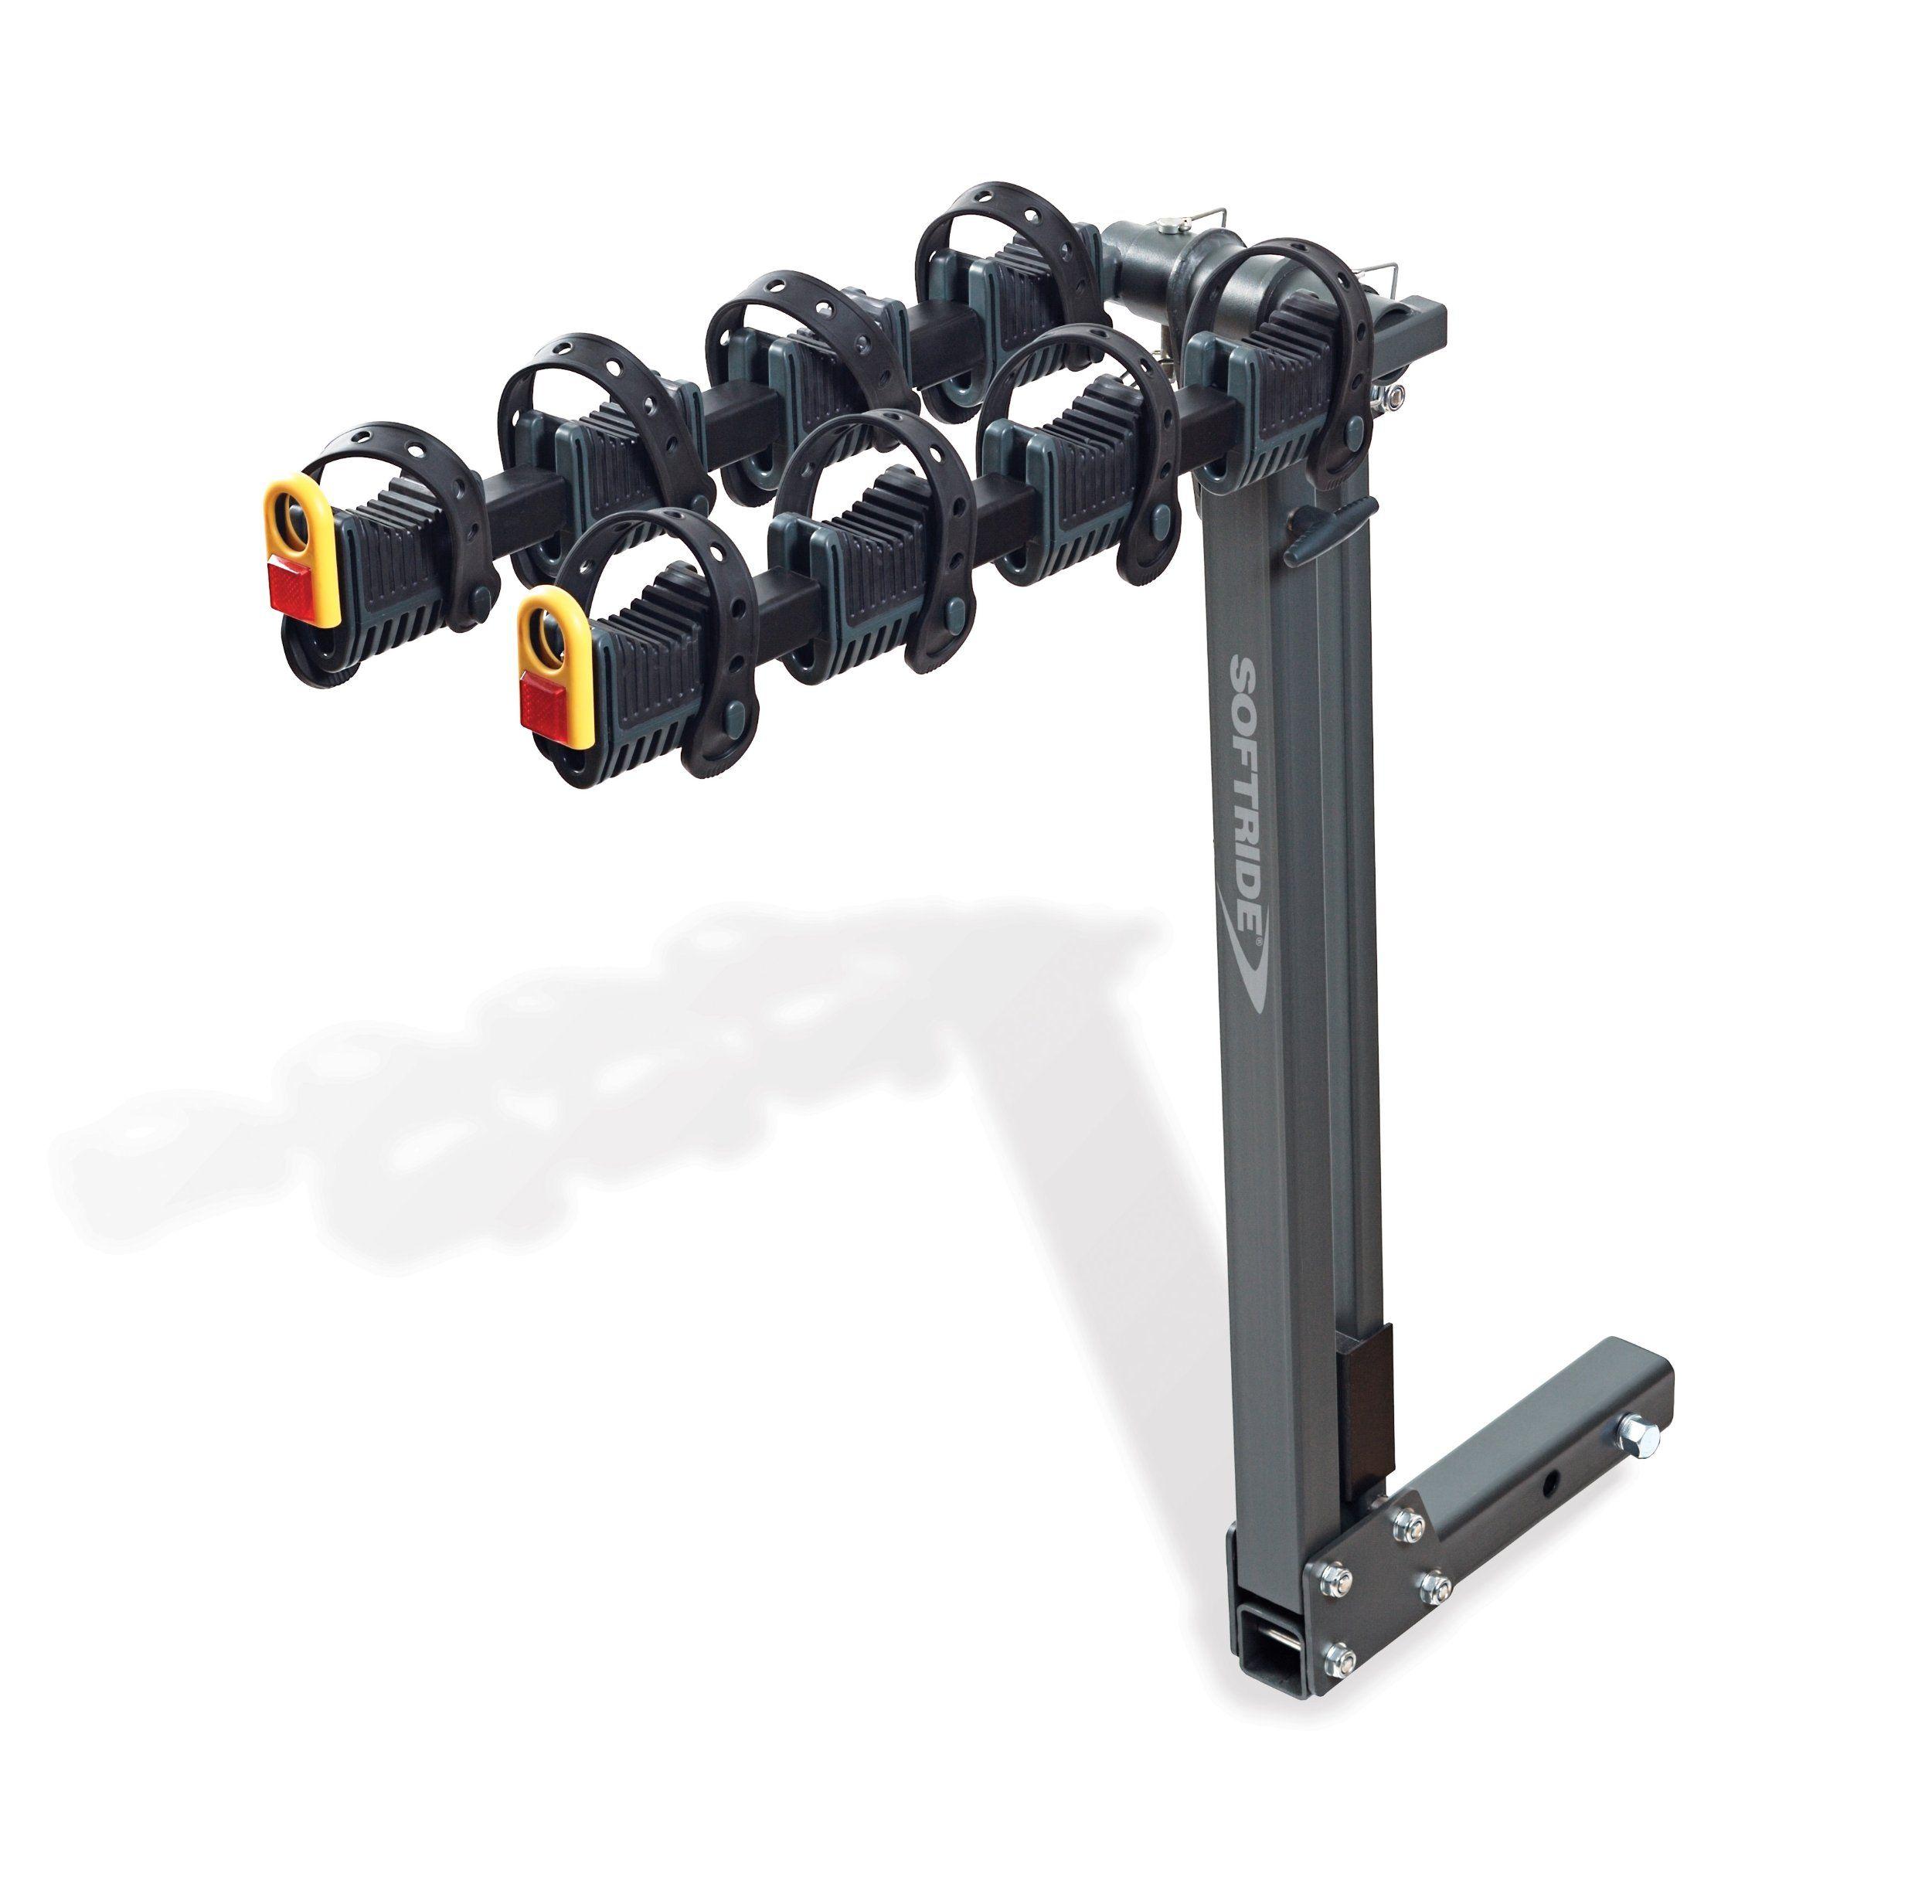 dual bike arm racks id u media supplies curt moving movingsupplies four haul rack